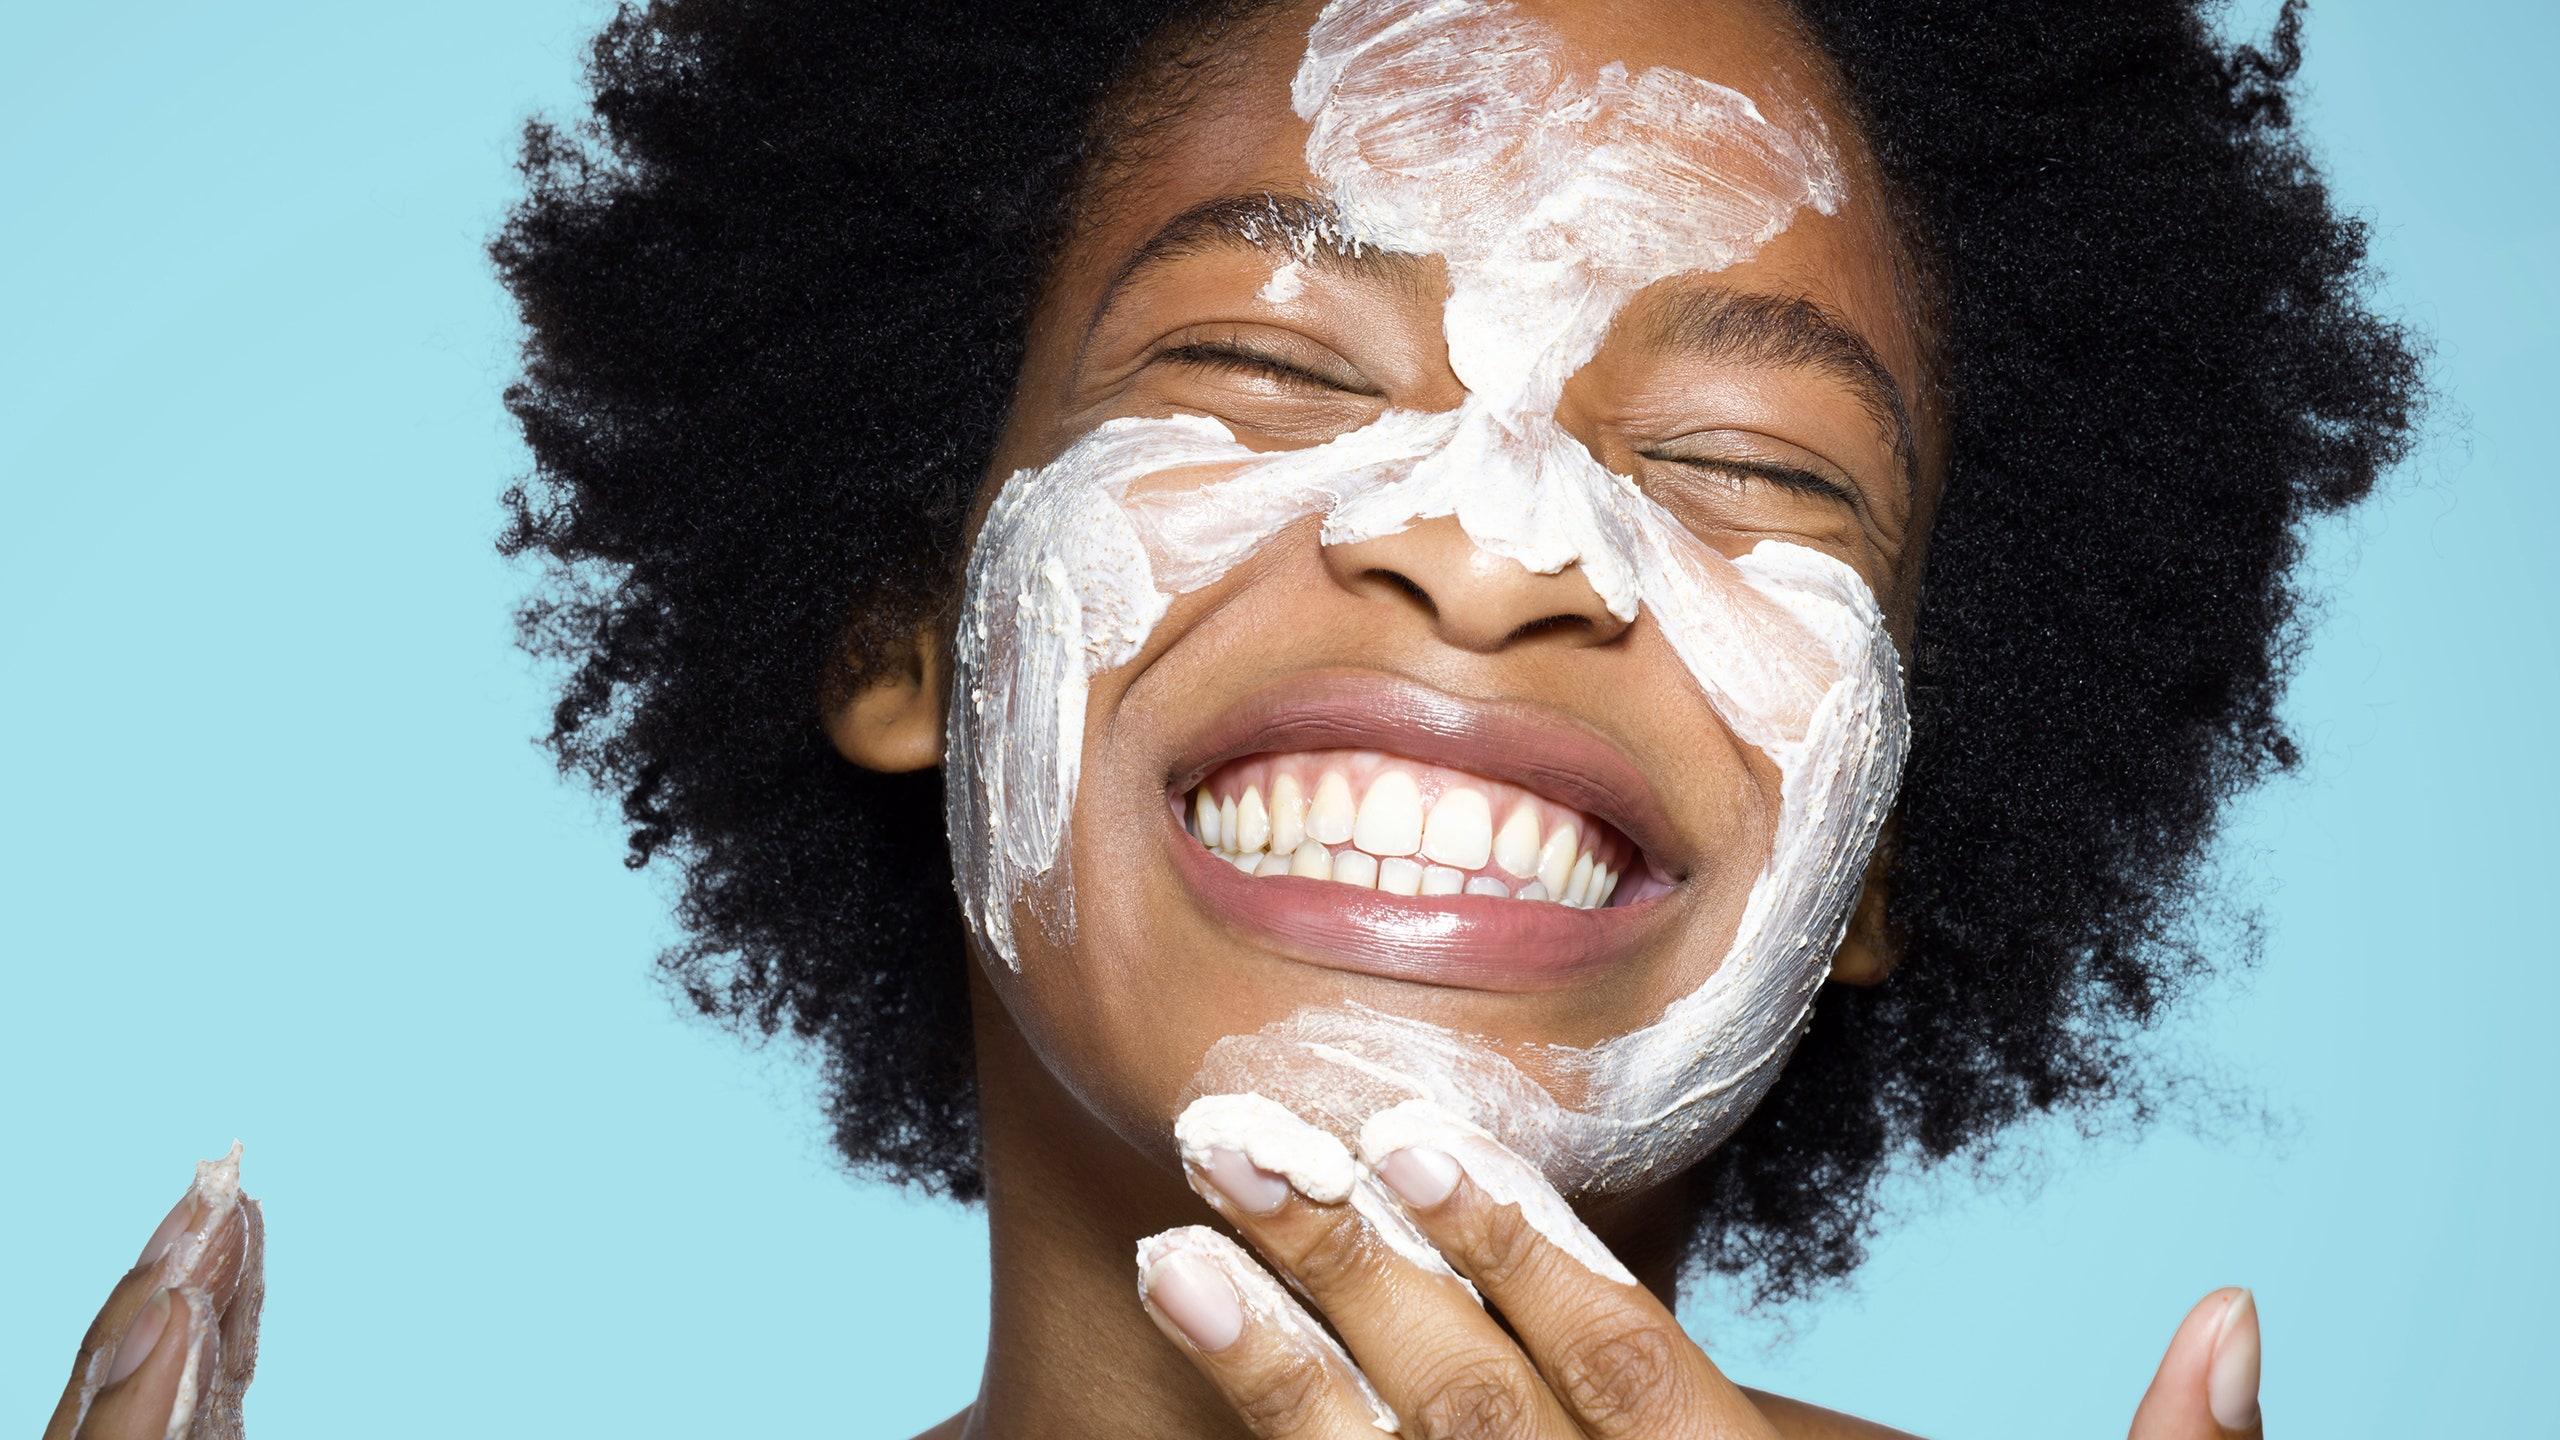 Applying sunscreen to prevent aging skin